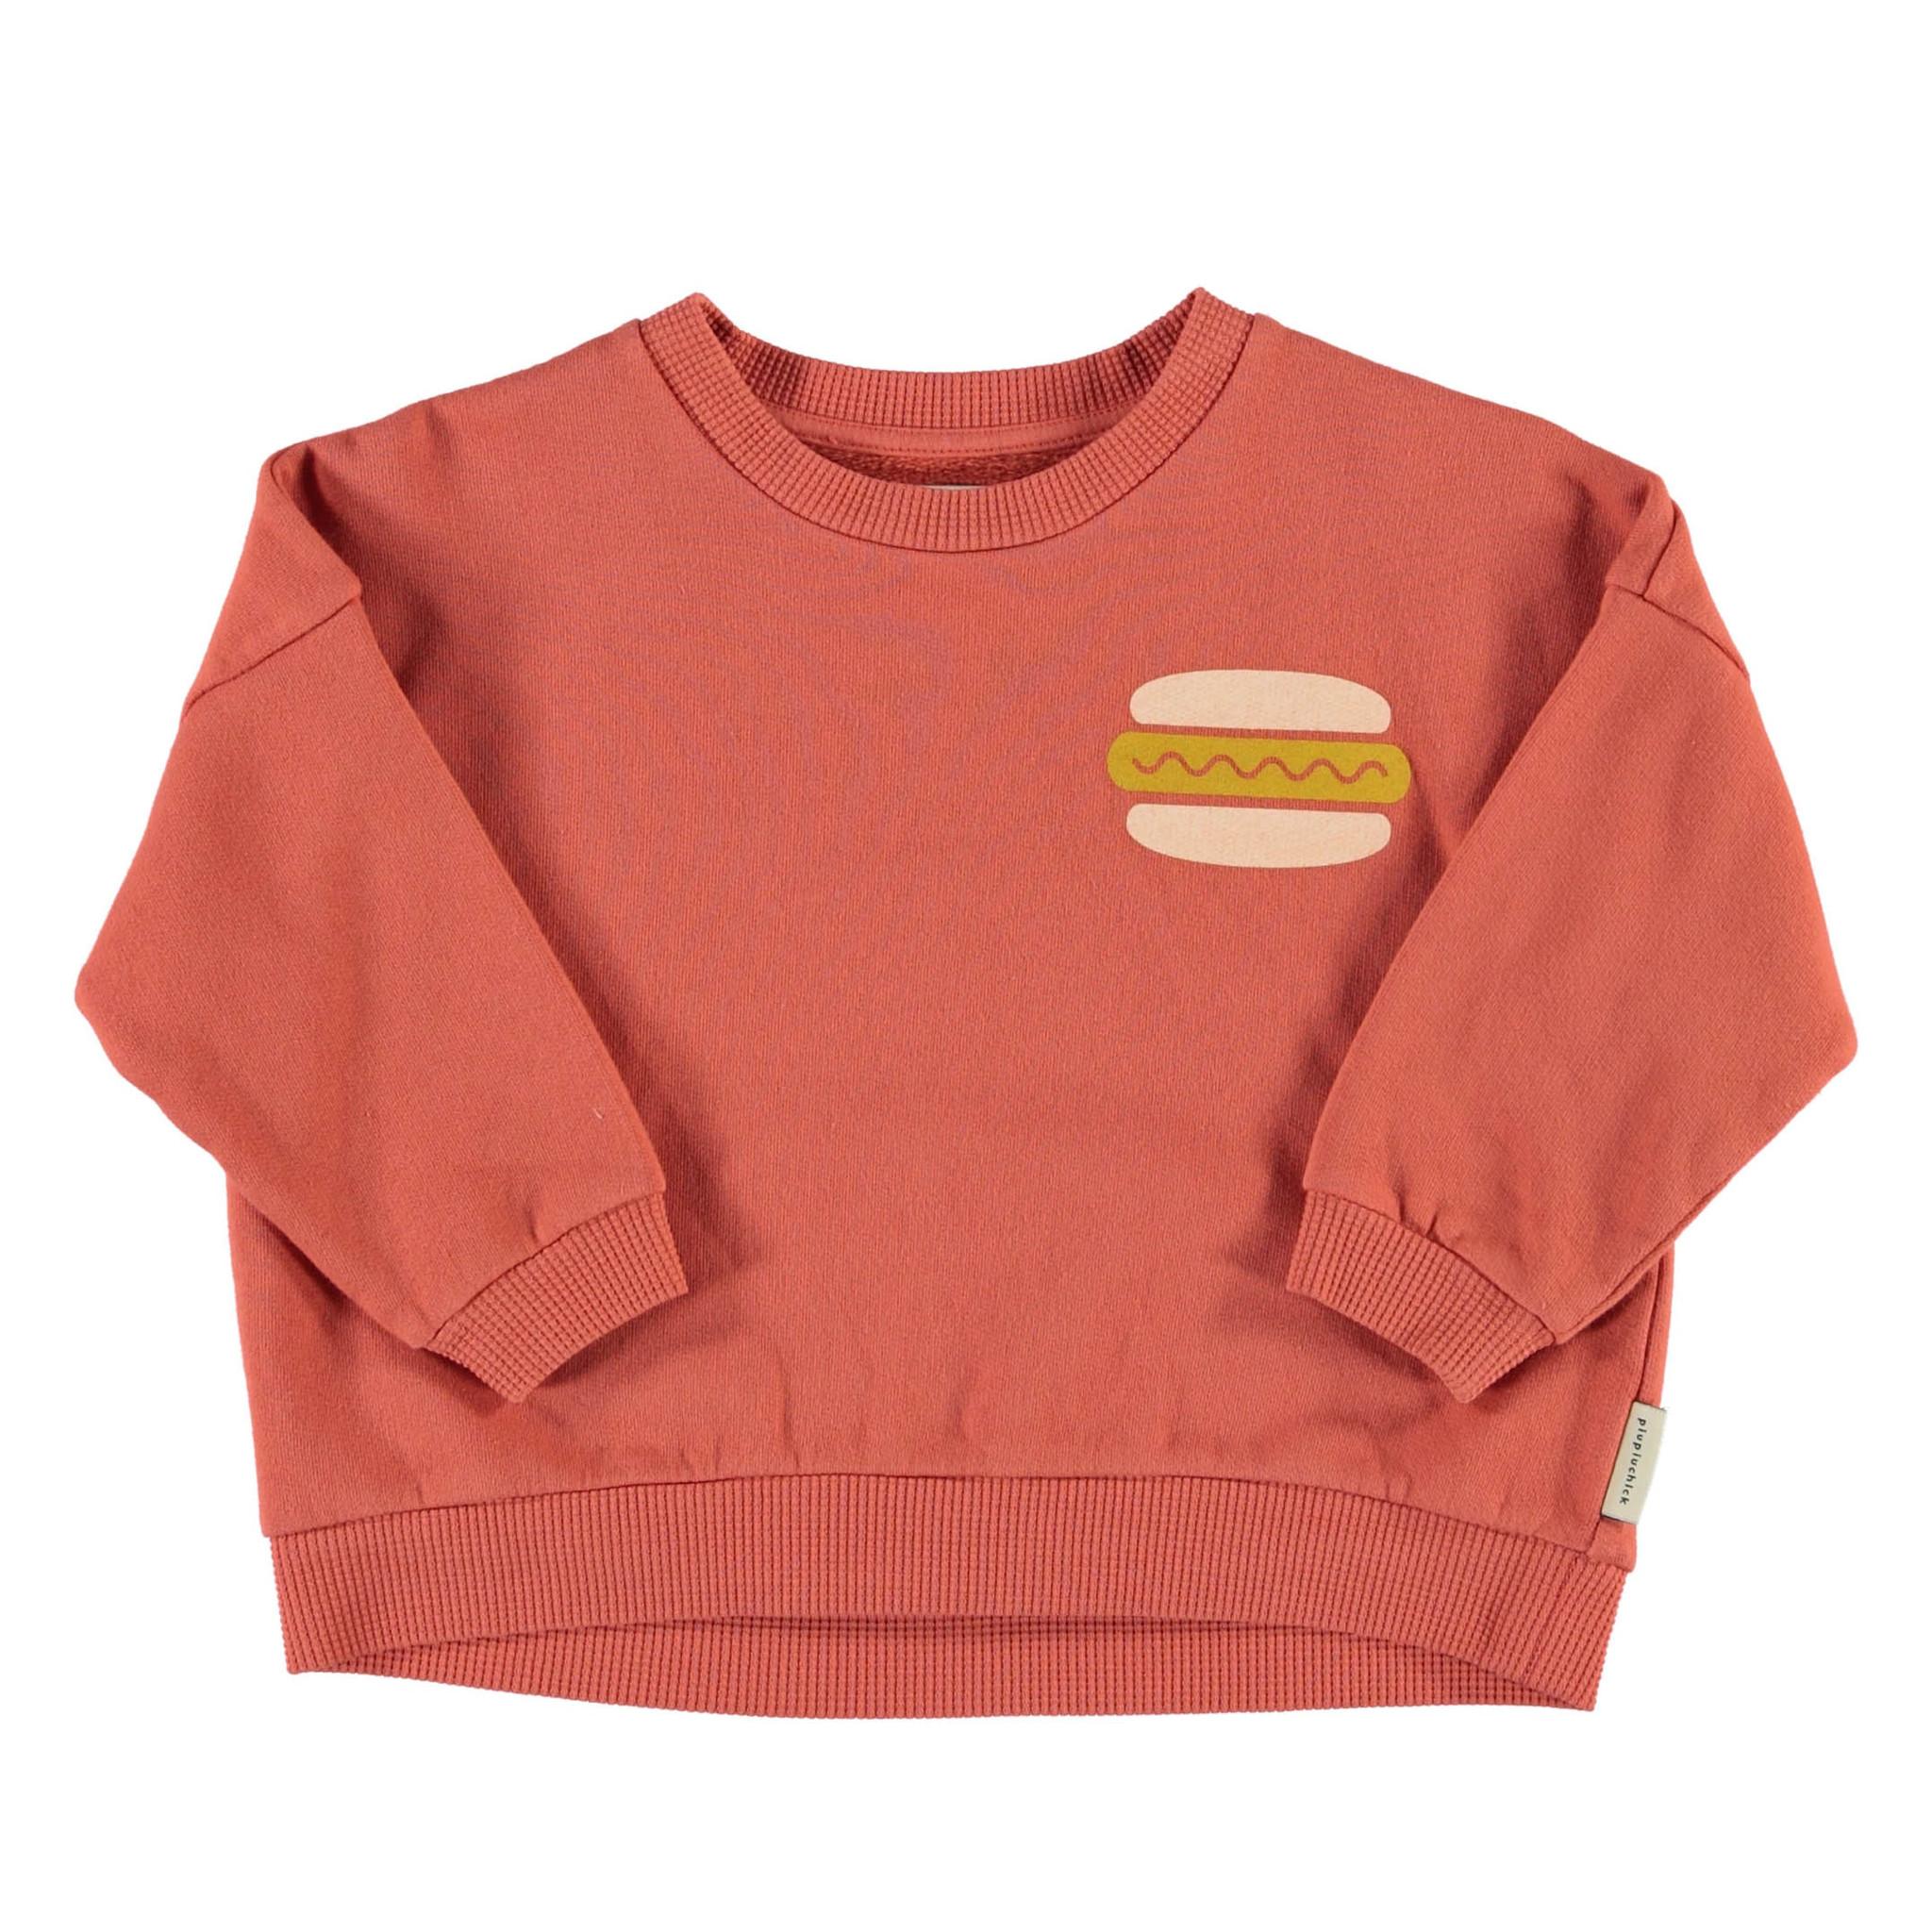 Unisex sweatshirt | brick w/ hot dog print-1